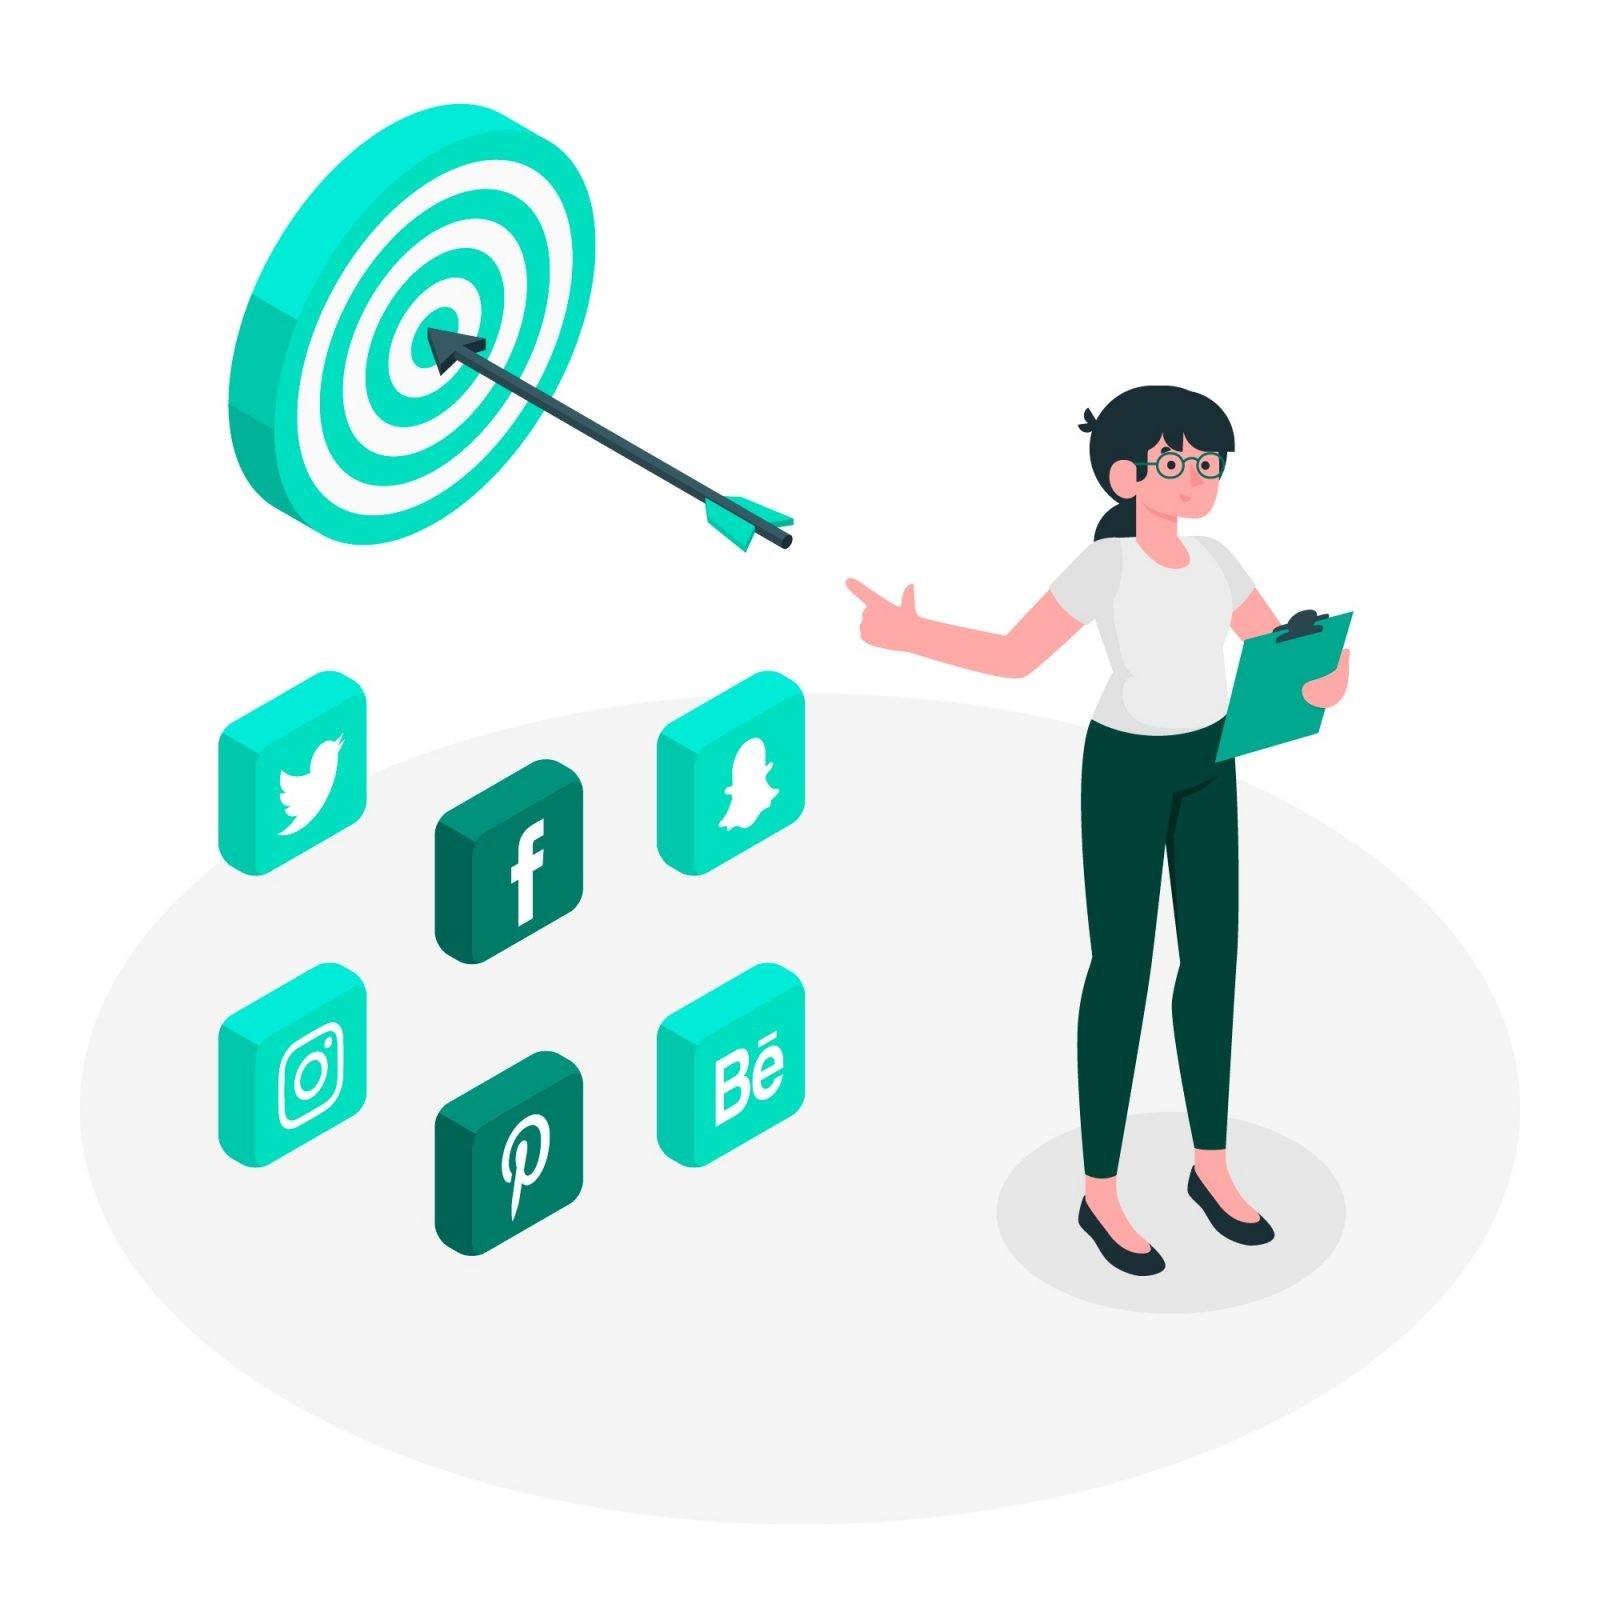 La web como base de tu estrategia de marketing - ExpacioWeb